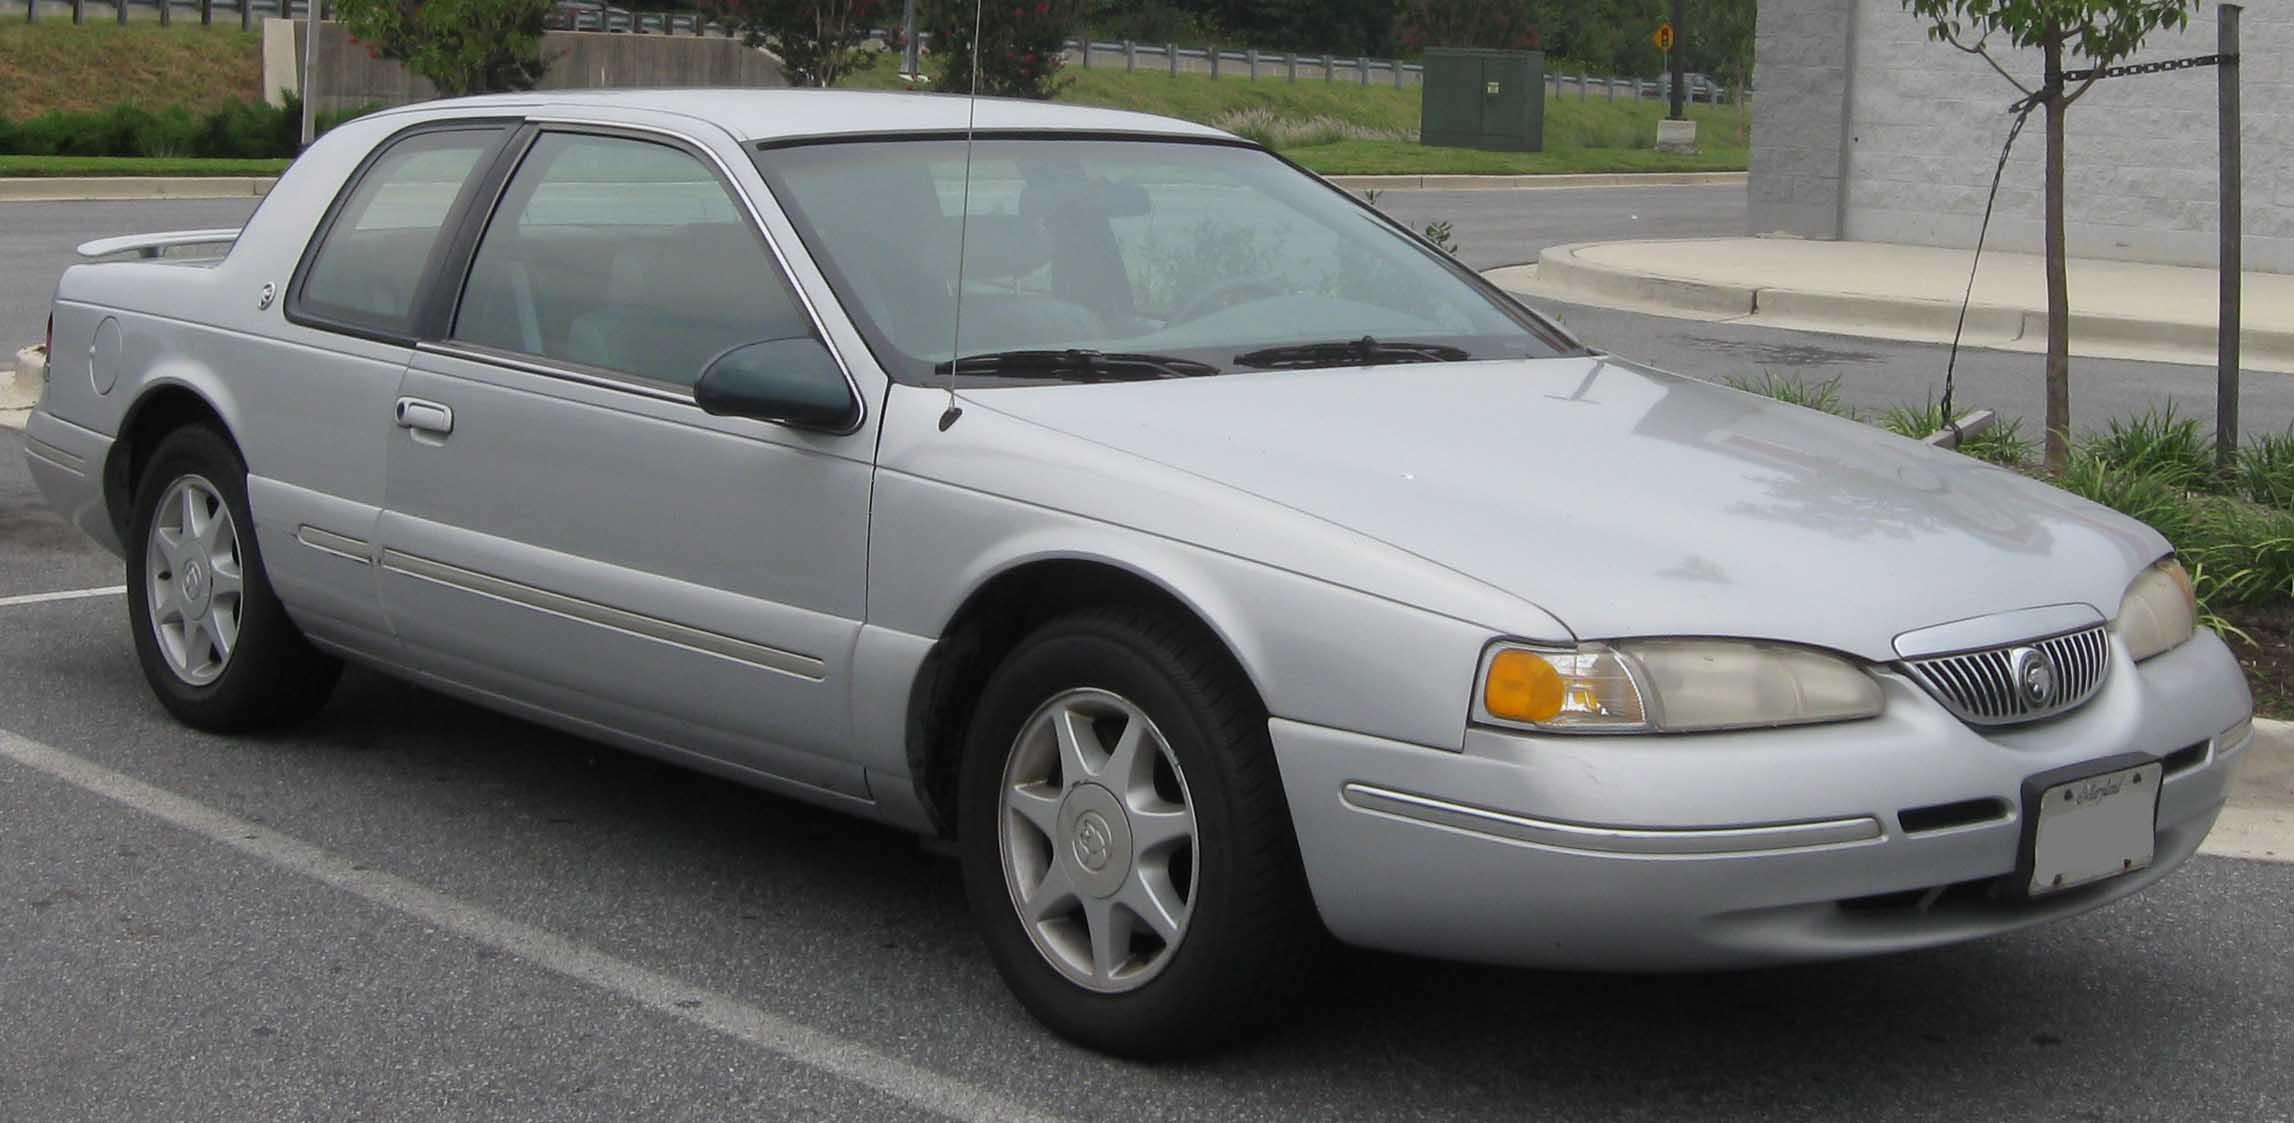 1994 mercury cougar vin check specs recalls autodetective 1994 mercury cougar vin check specs